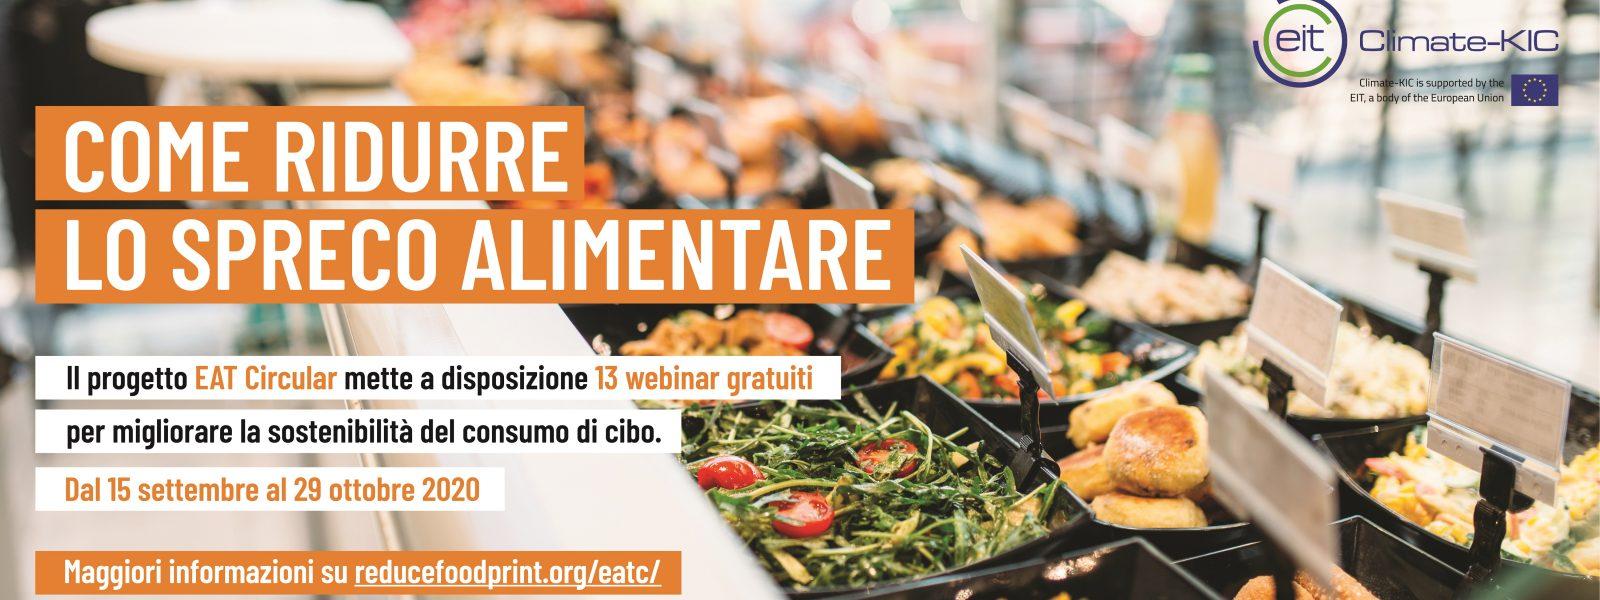 EAT-Circular - Save it for Good! - 5 webinar